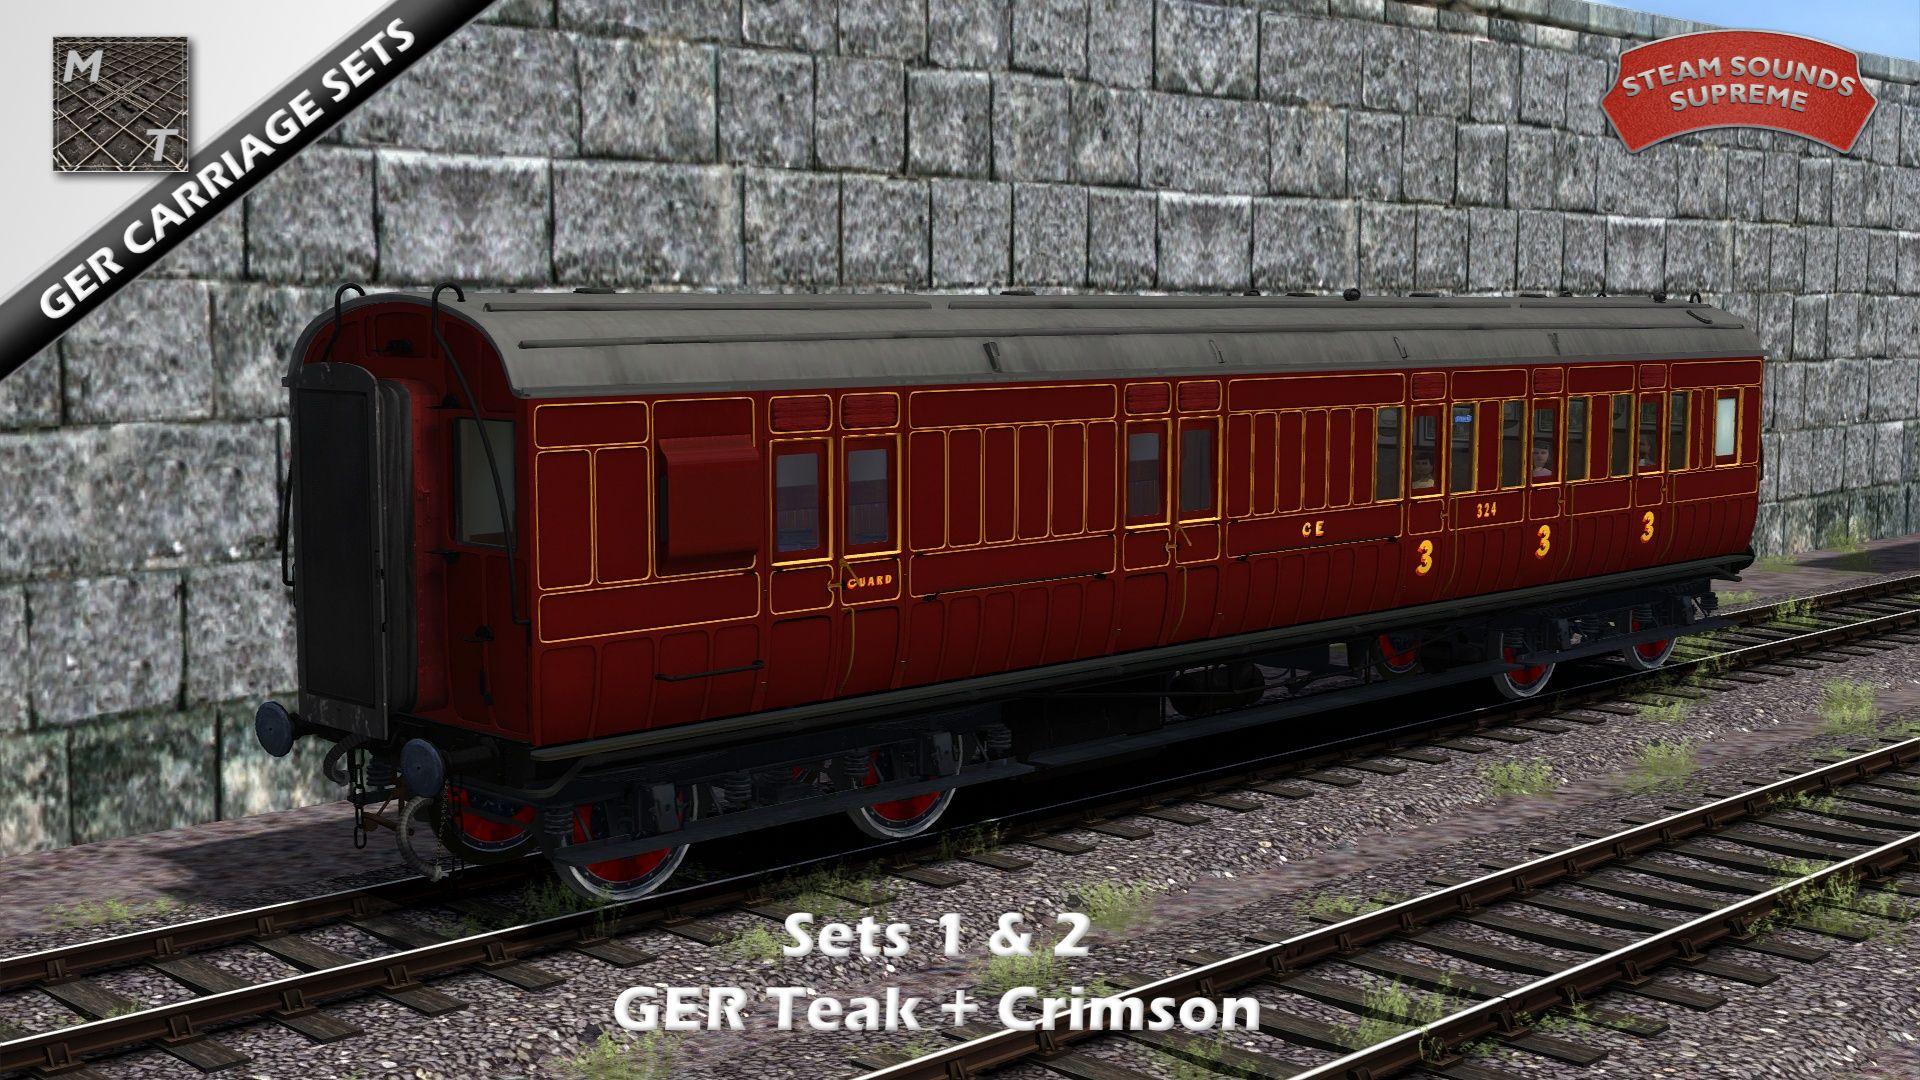 GERCorrSet1-2_15.jpg